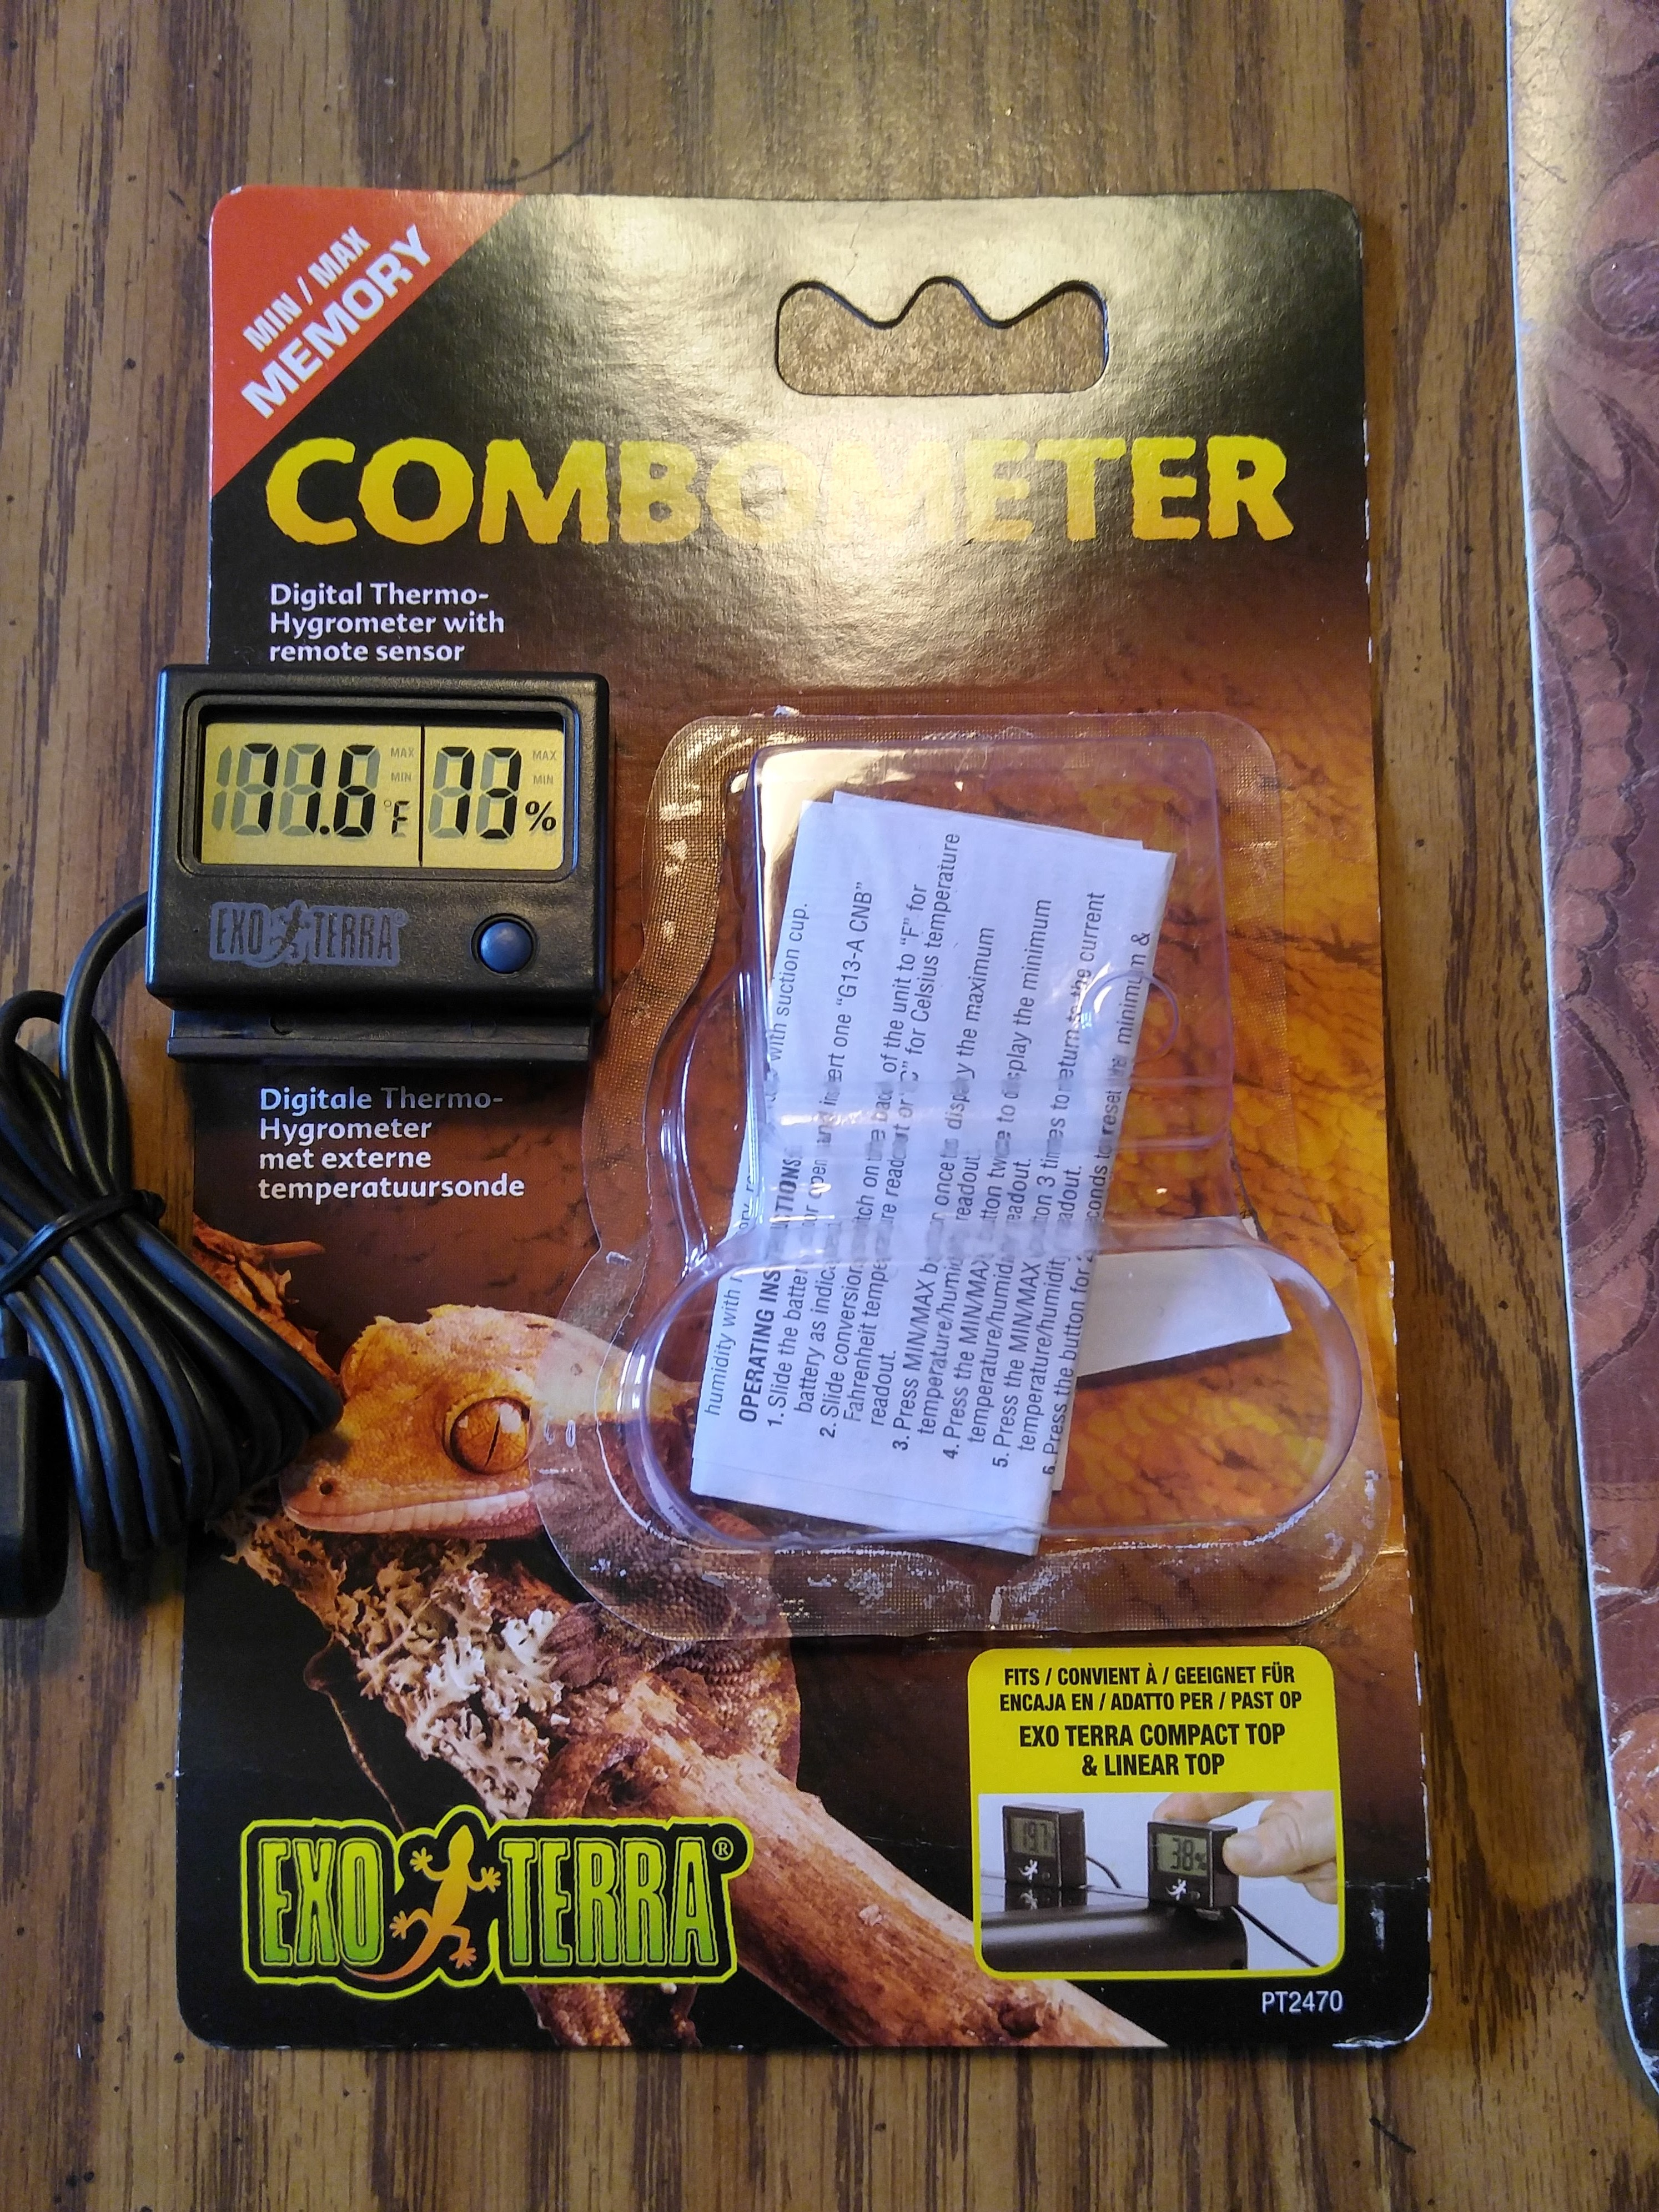 EXO TERRA Thermometer/ Hygrometer Combo